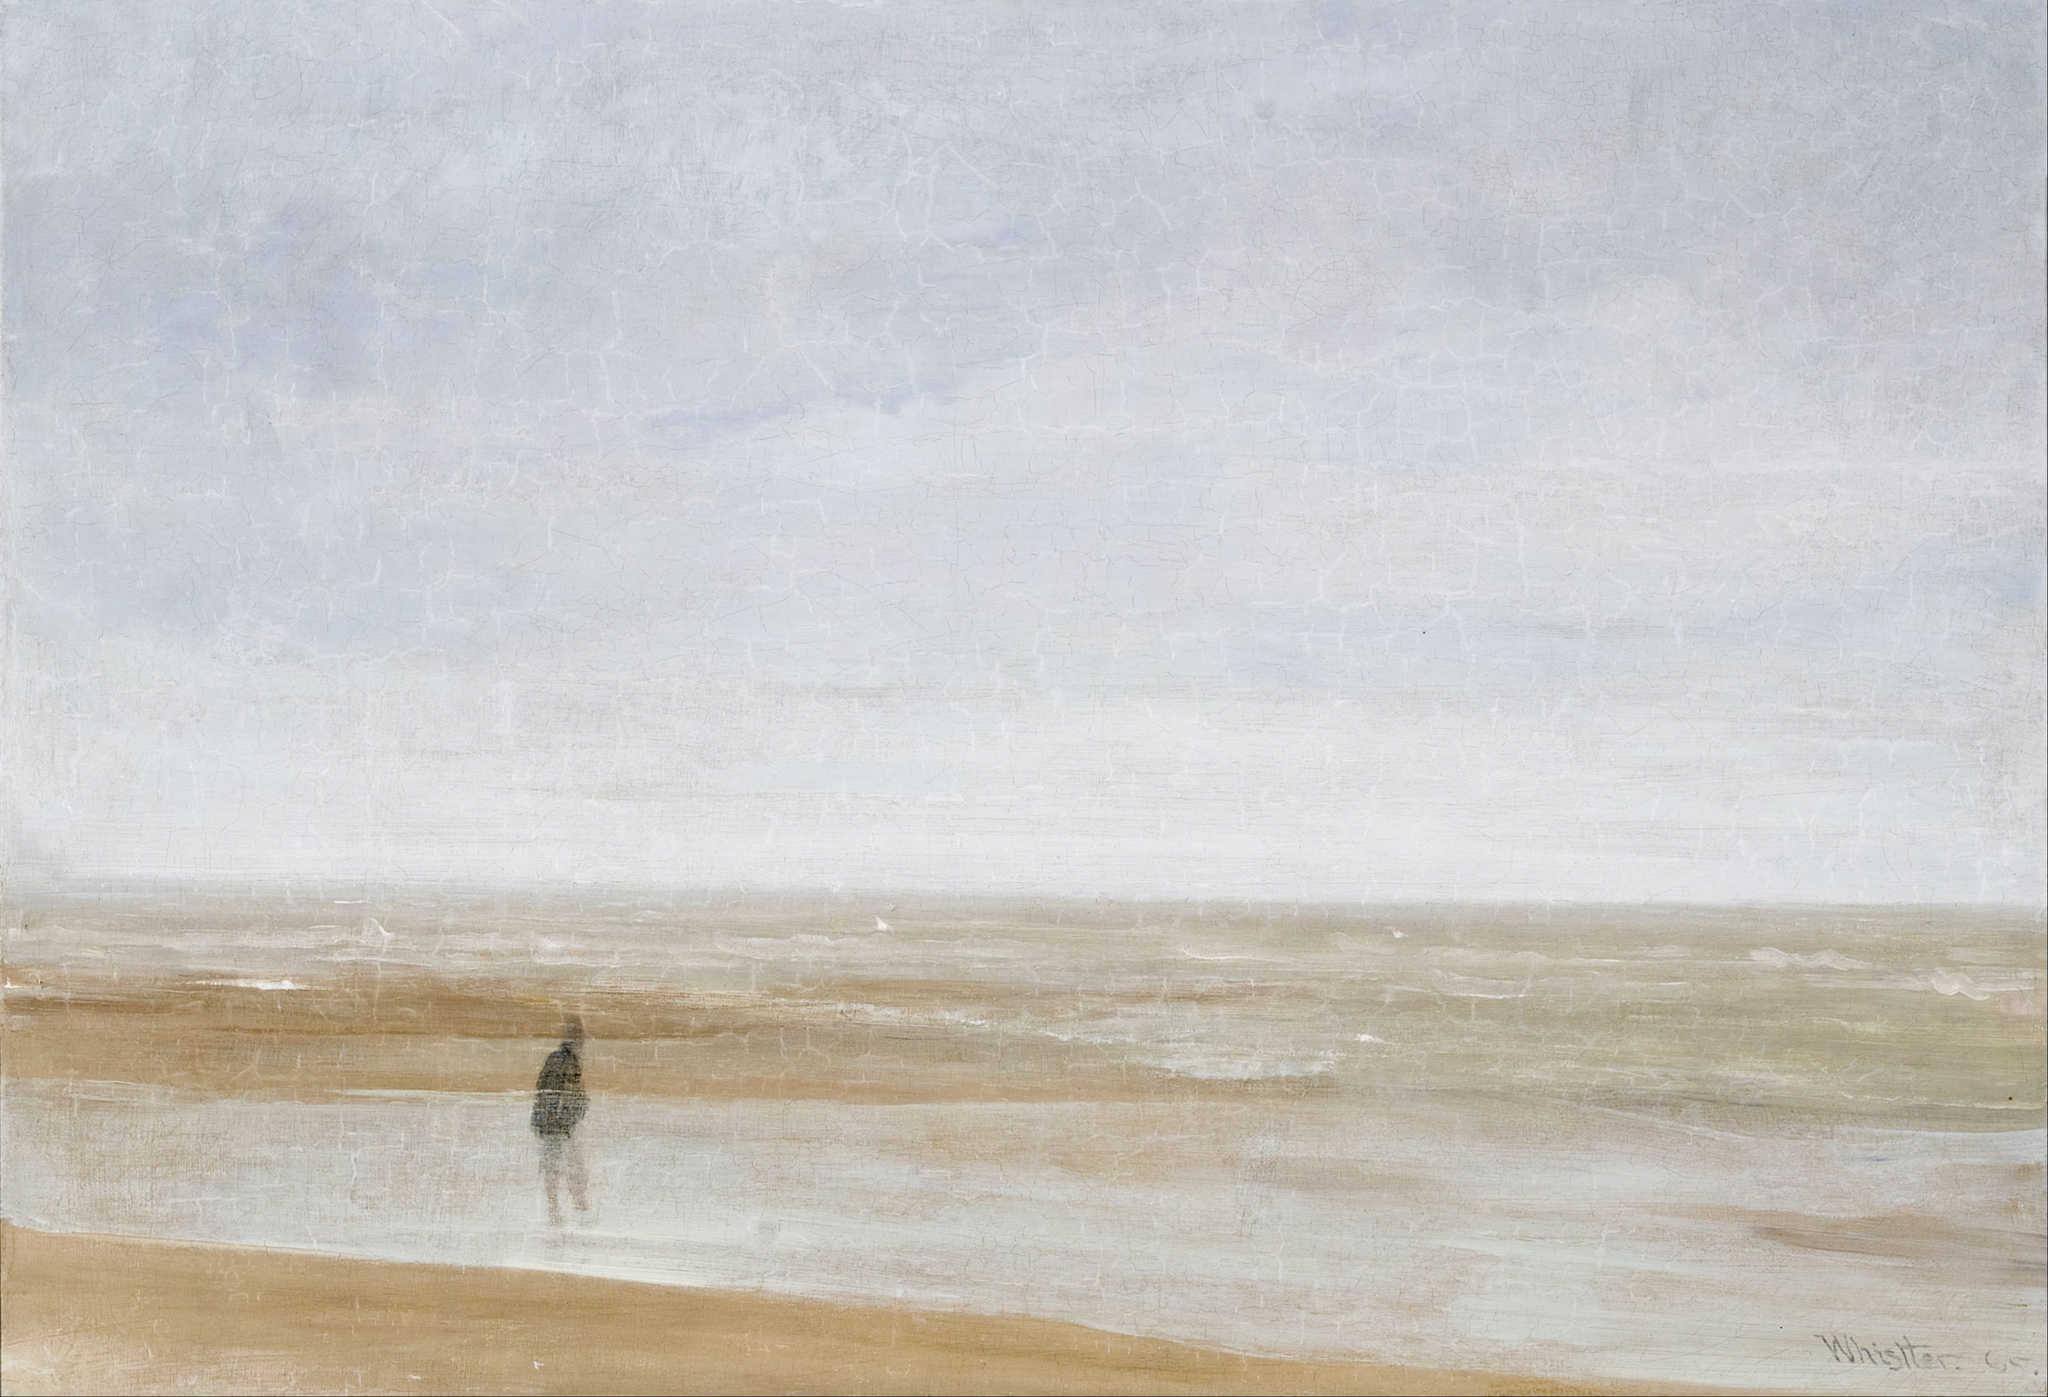 James McNeill Whistler, Sea and Rain